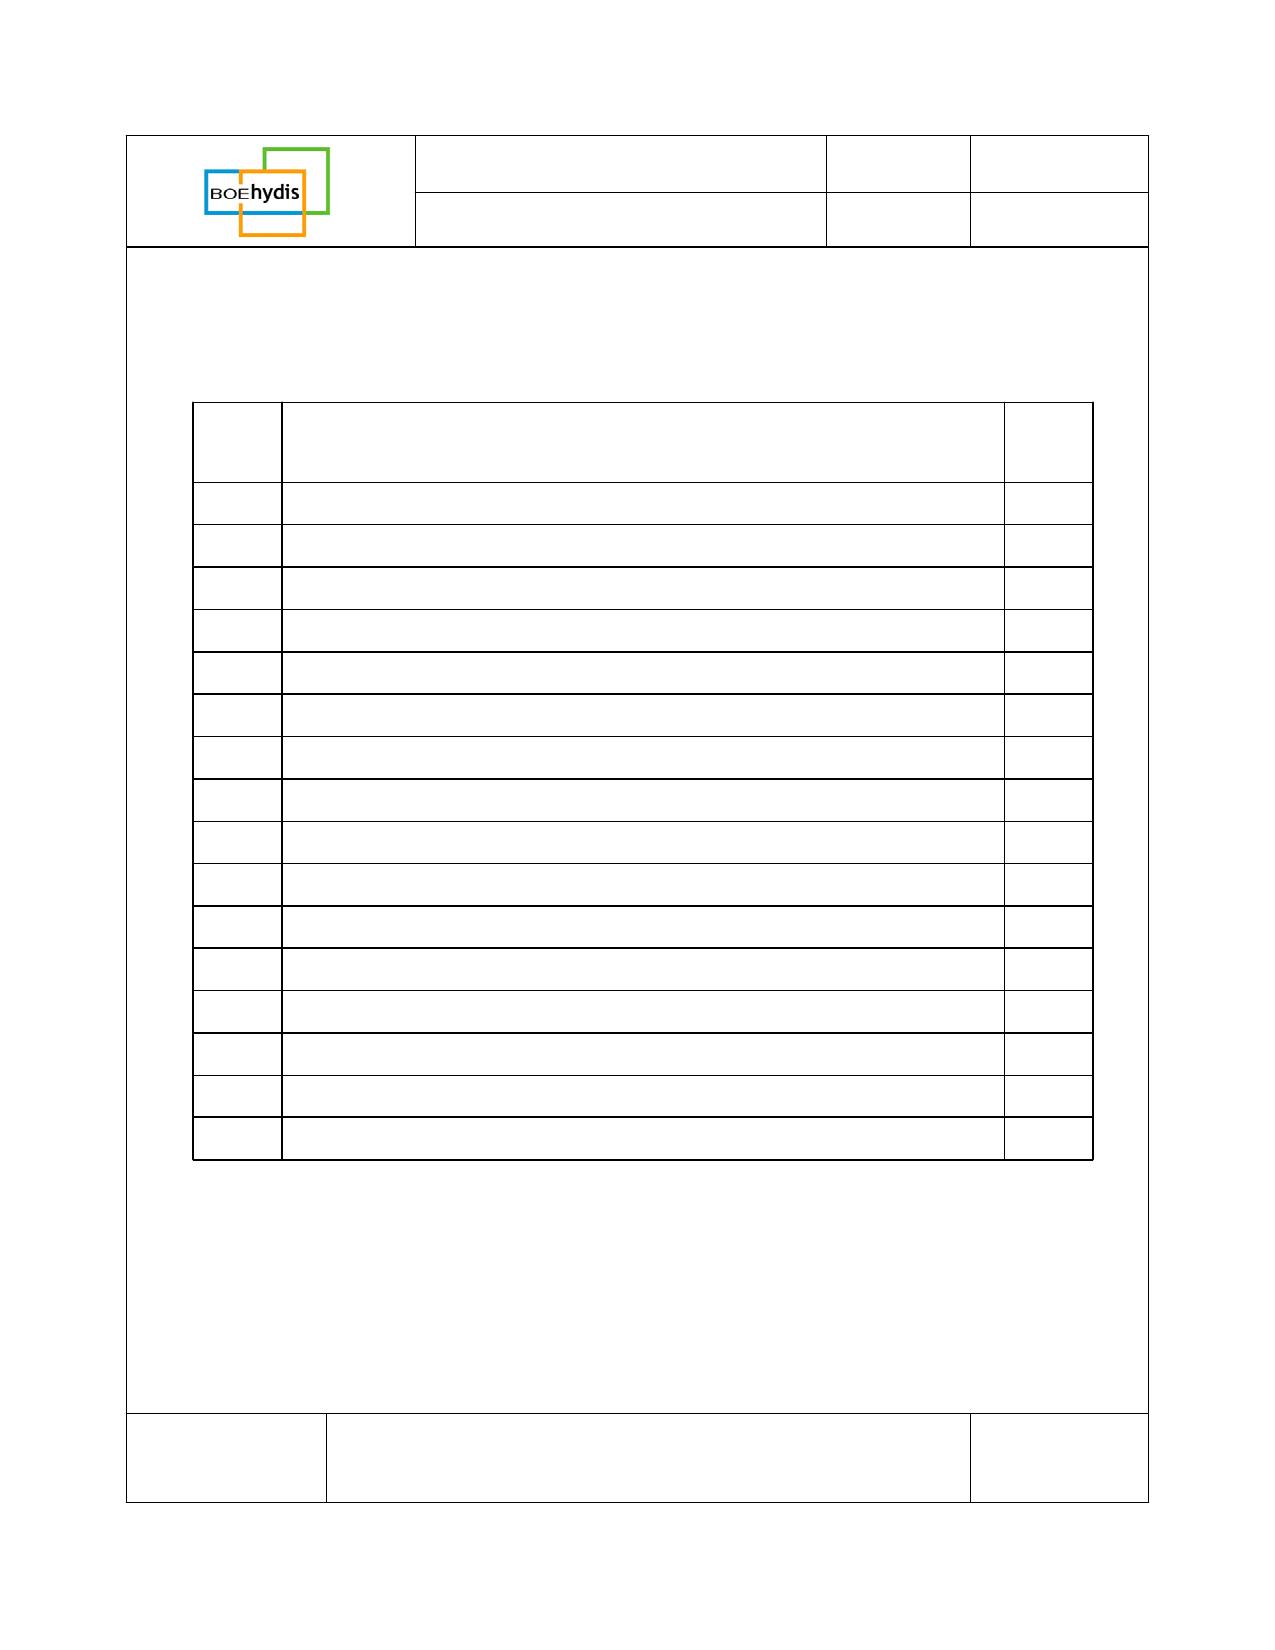 HV133WX1-100 pdf, ピン配列